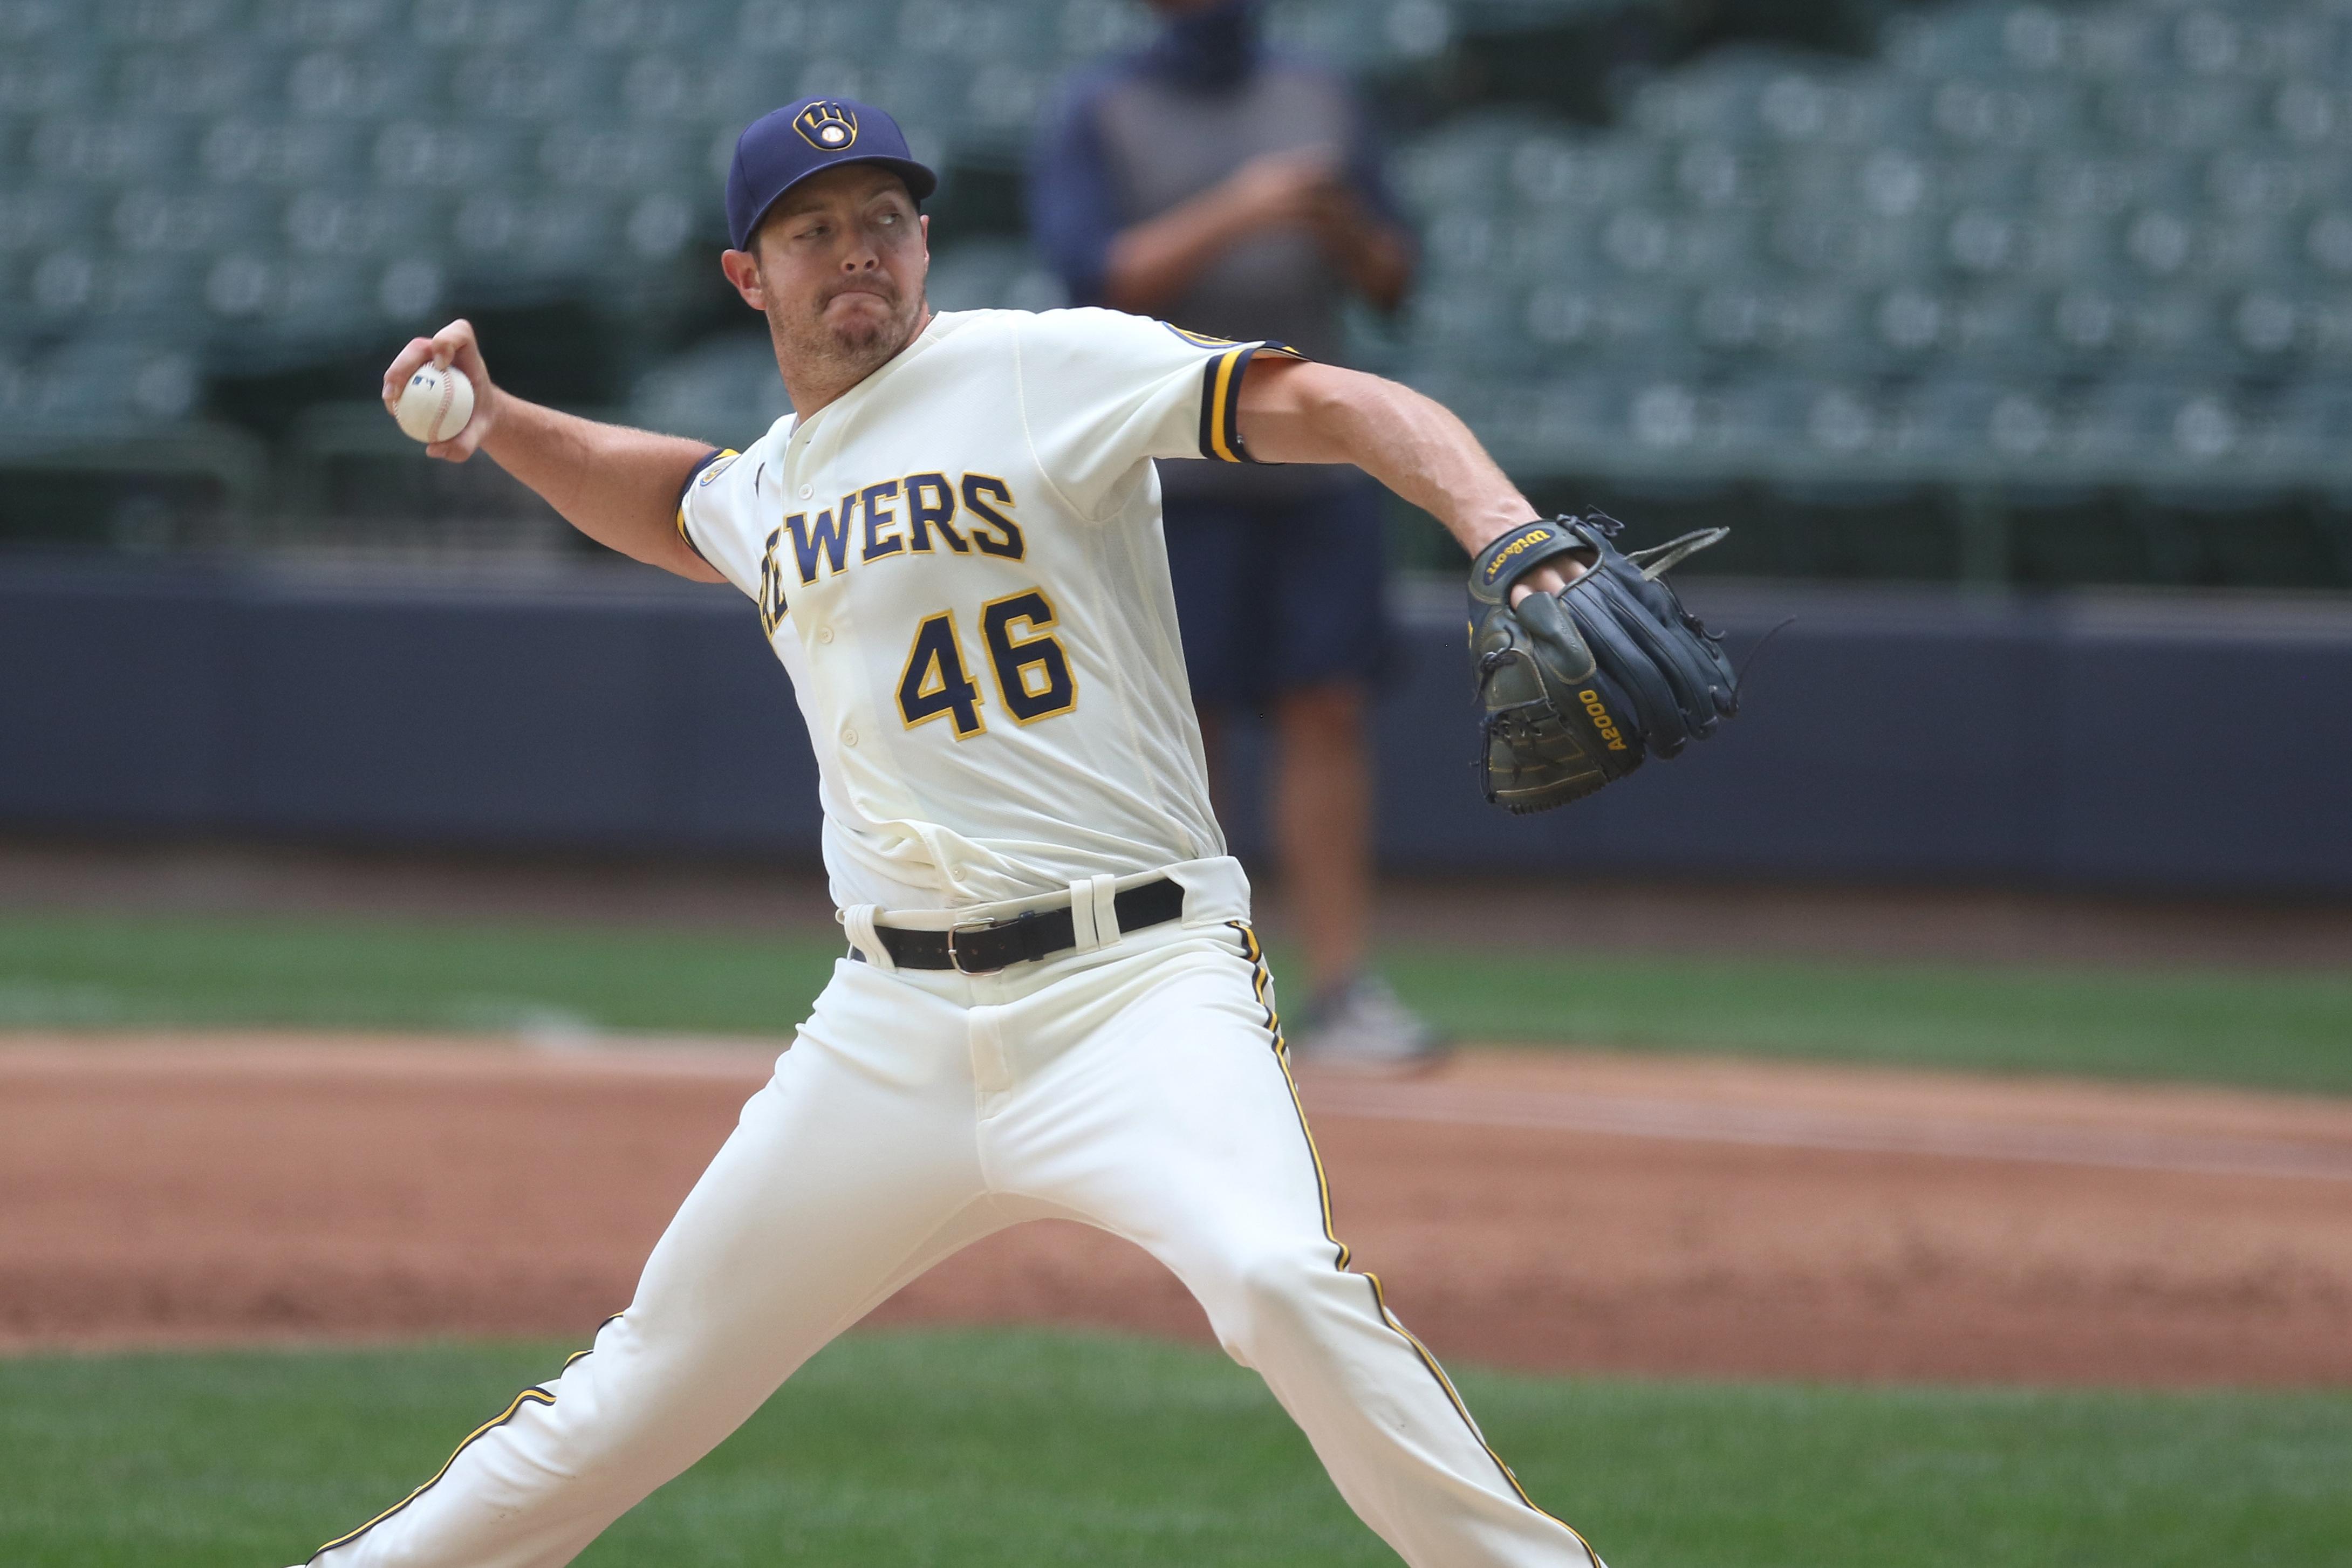 MLB: JUL 10 Brewers Summer Camp